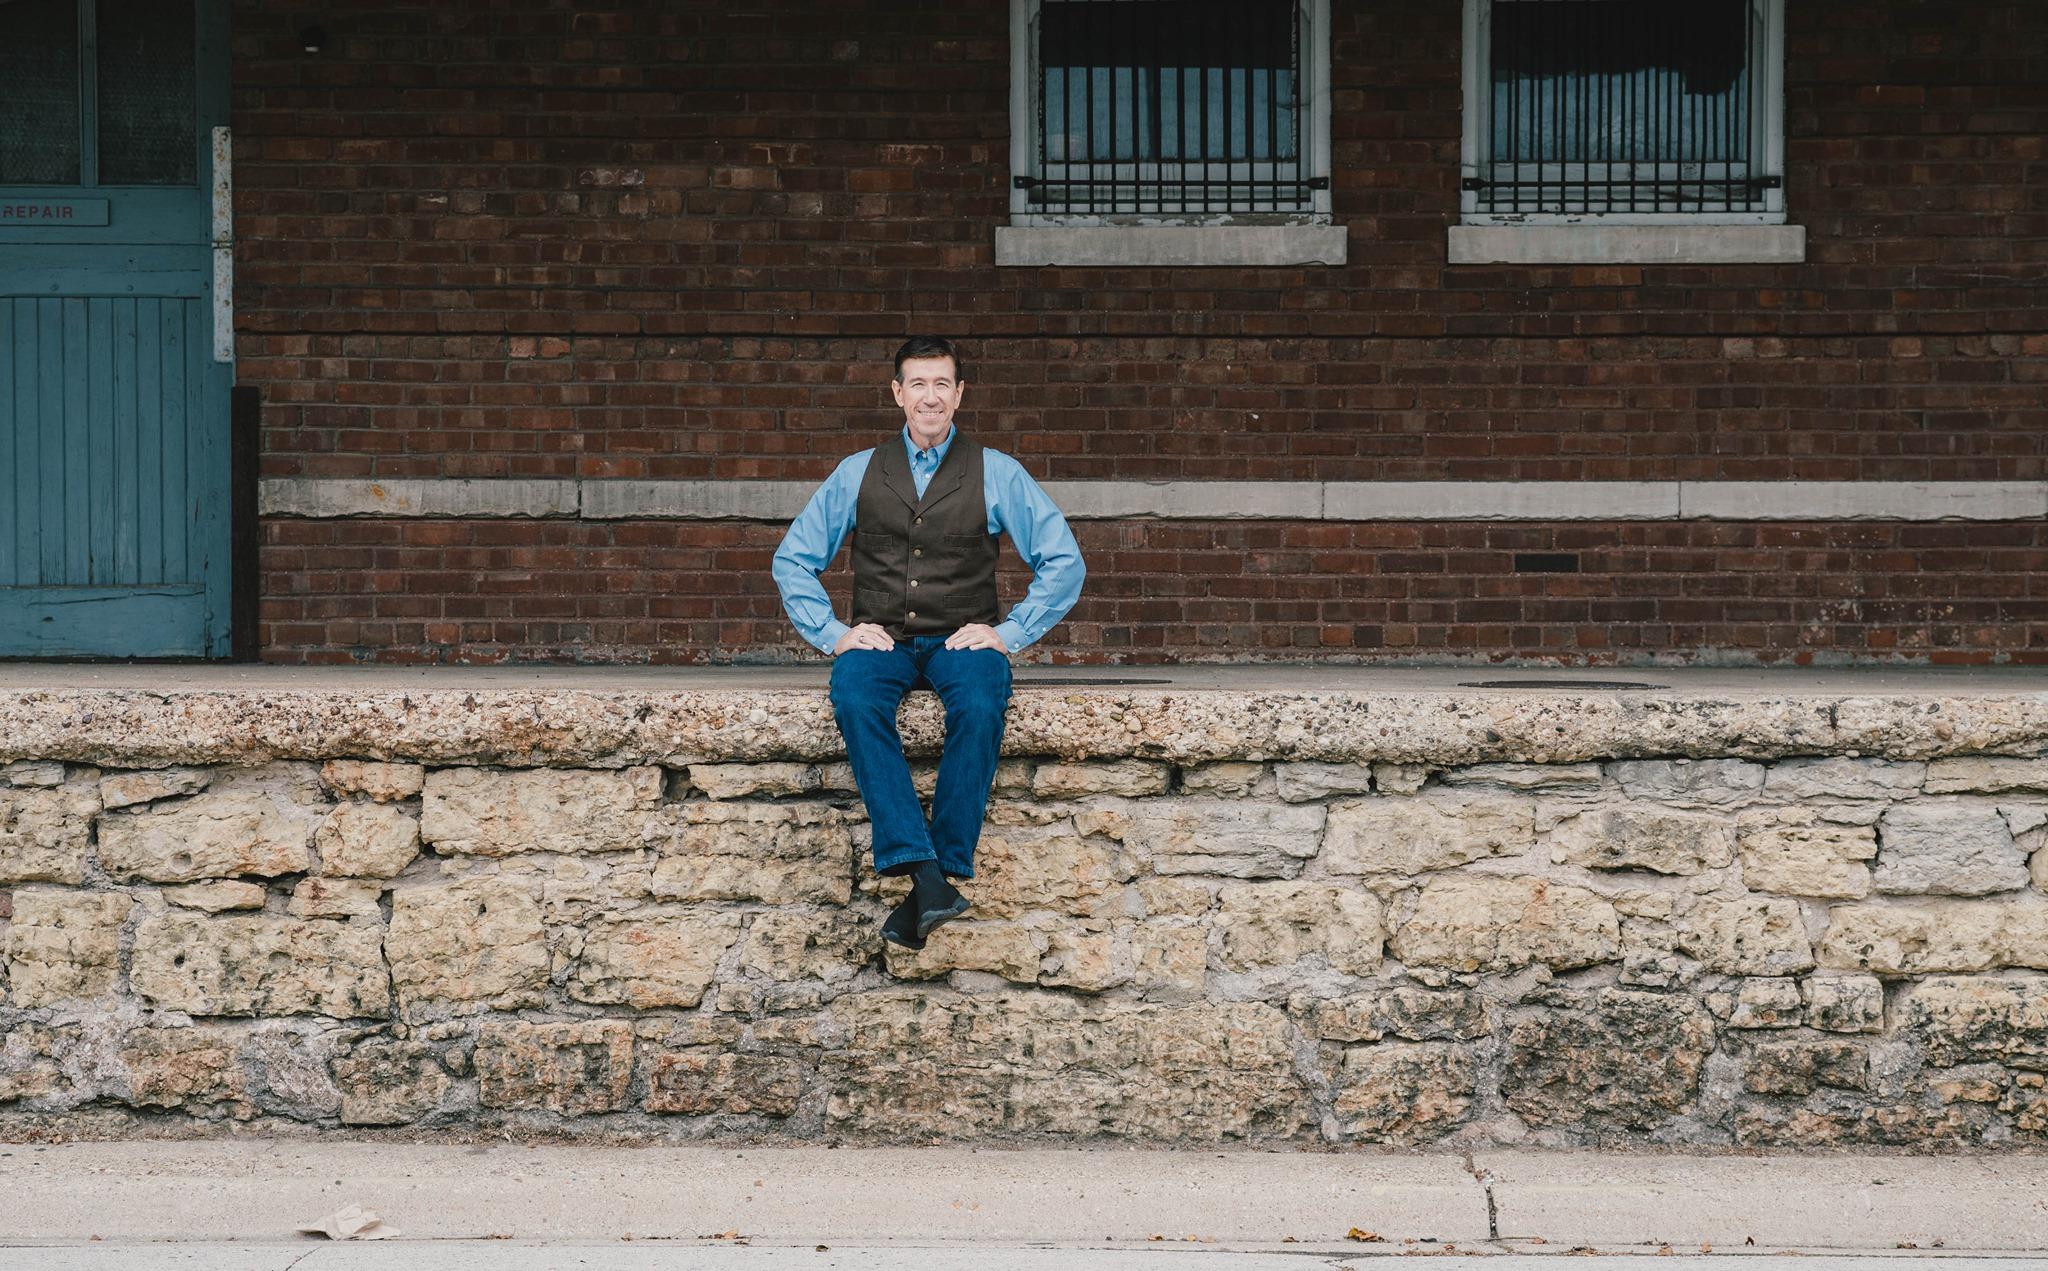 Second Saturday Concert Series – Denny Svehla : I Gotta Be Me